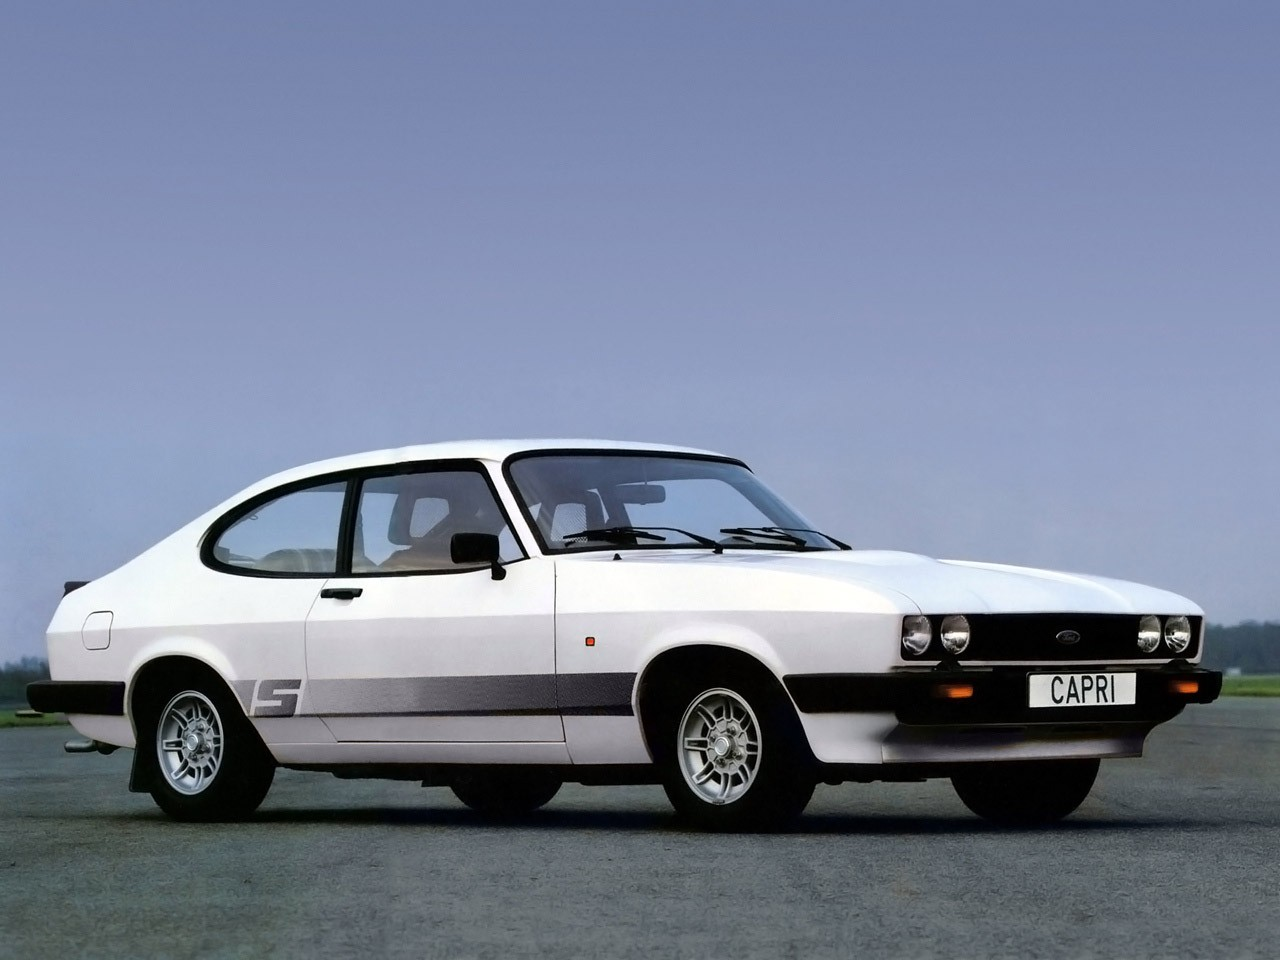 Ford Capri S 1978-1987